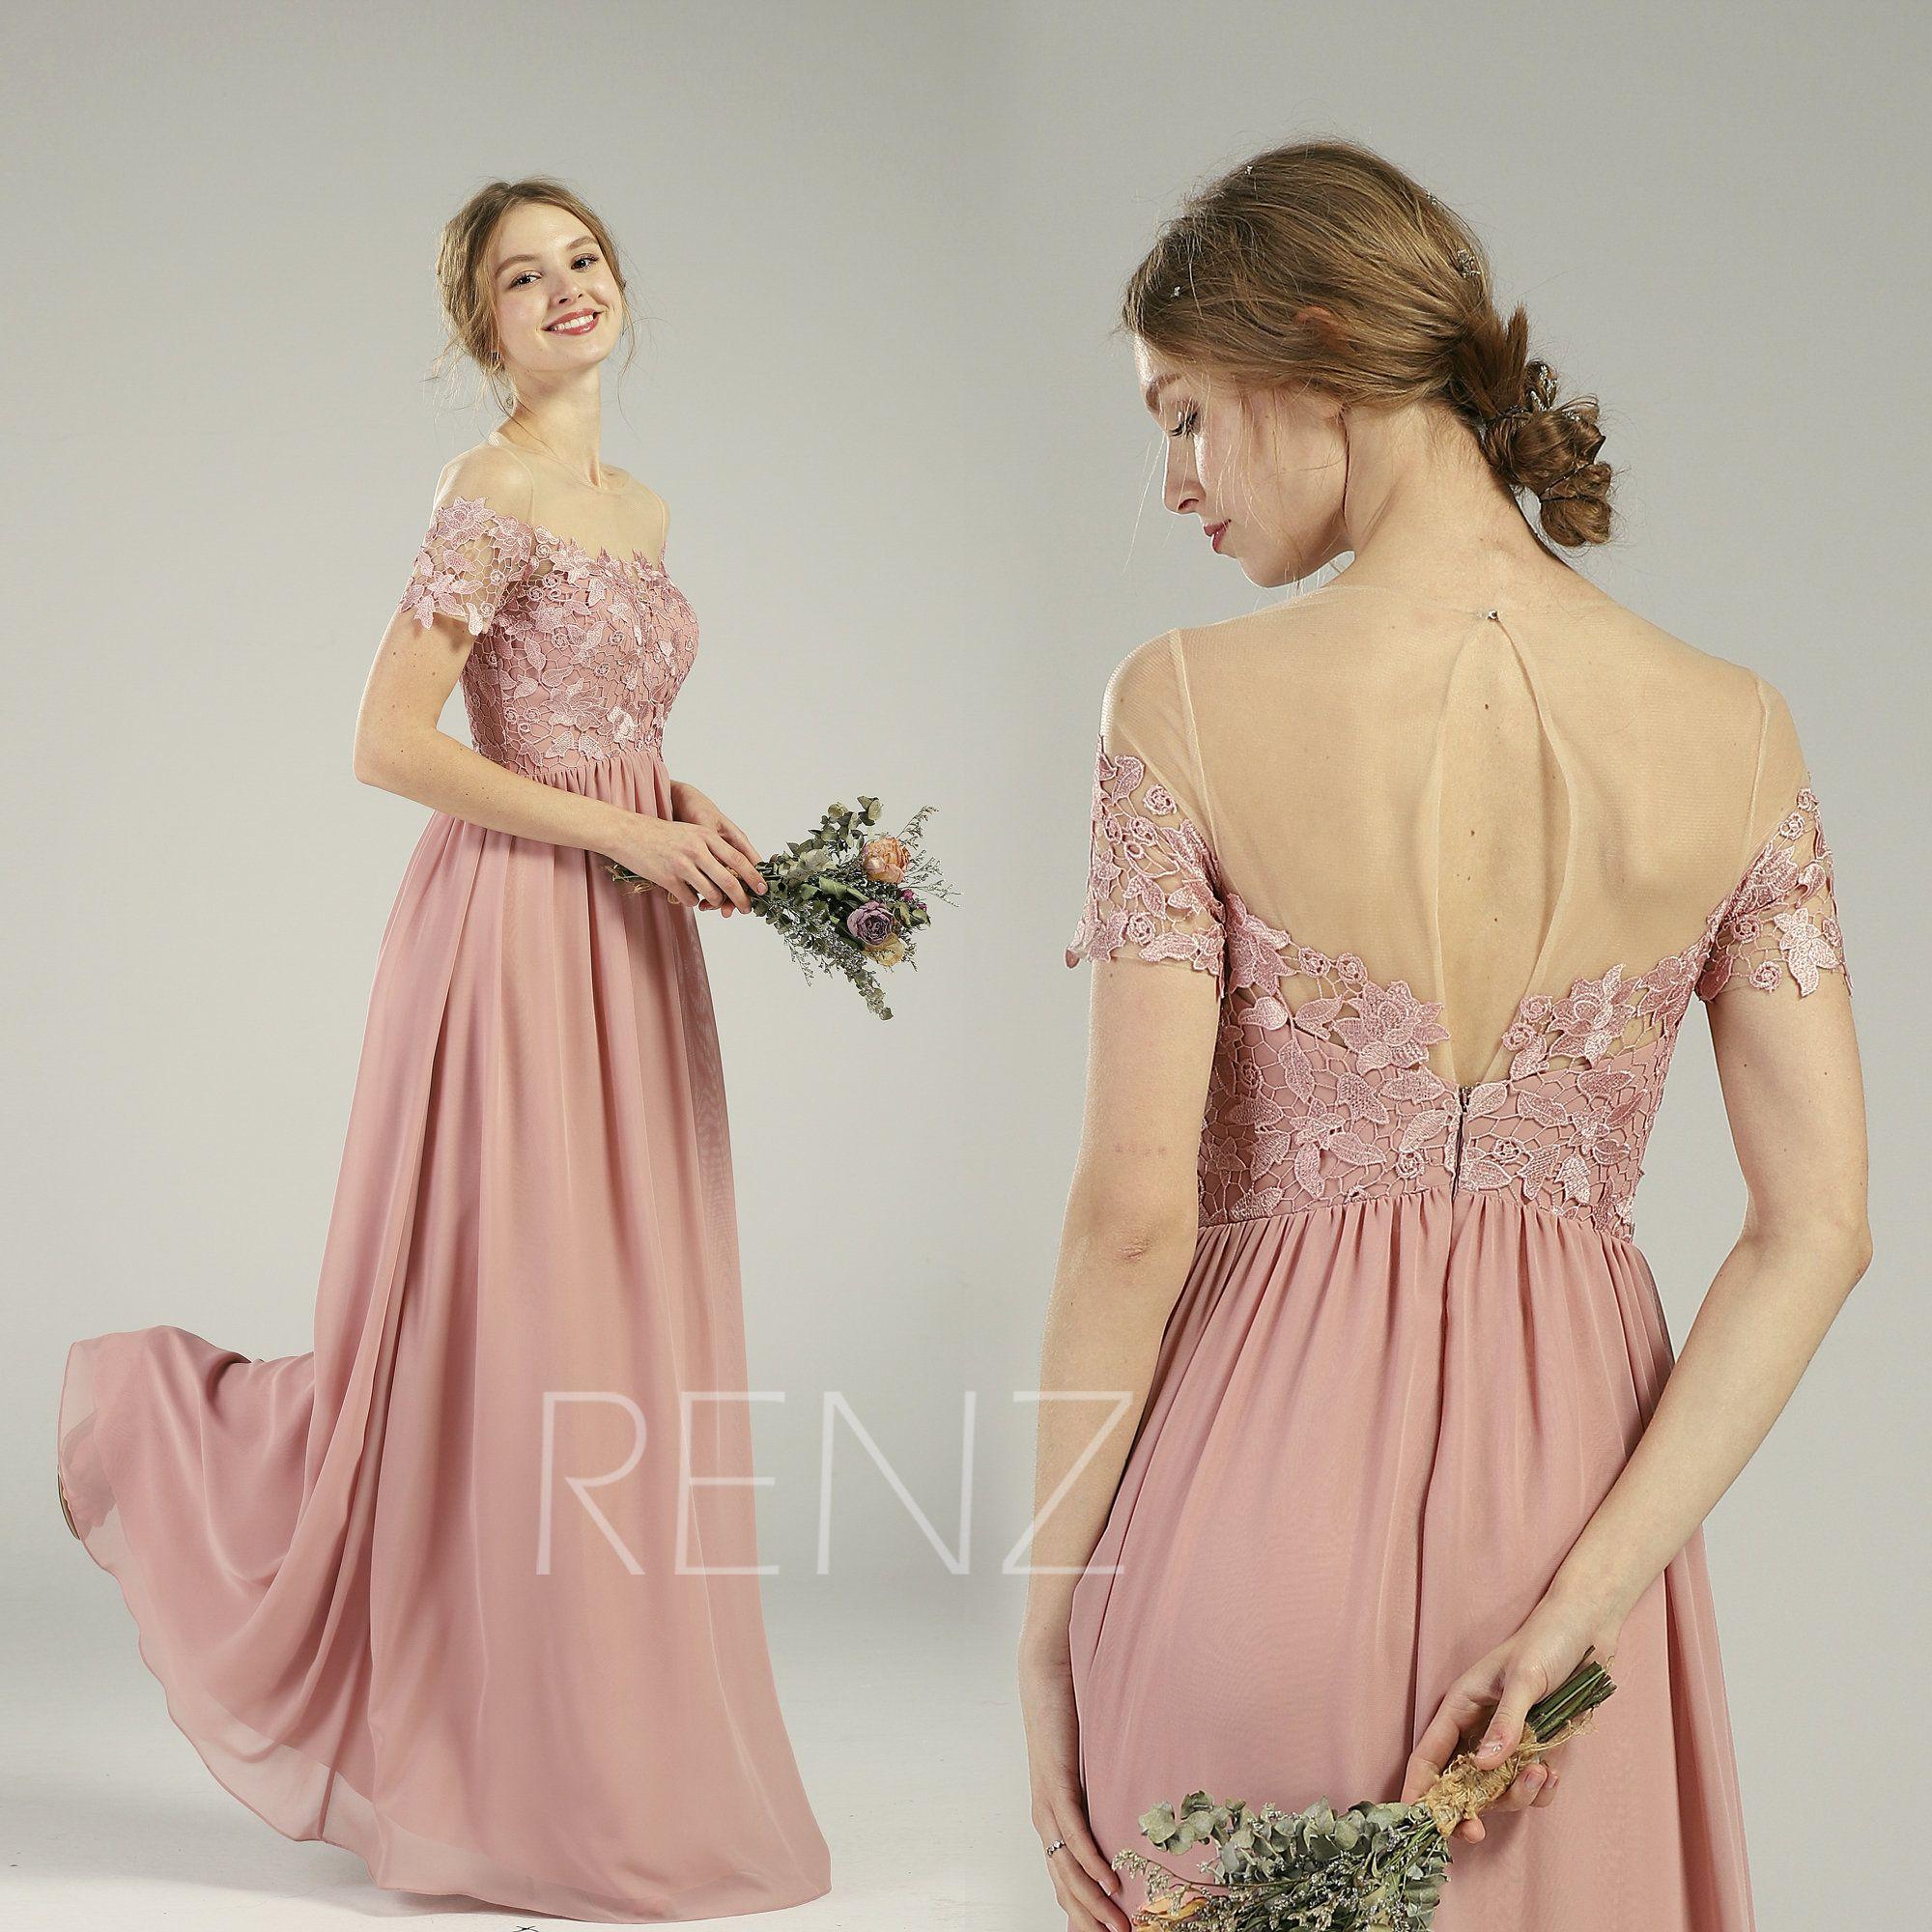 Dusty rose bridesmaid dress boho short sleeve party dress